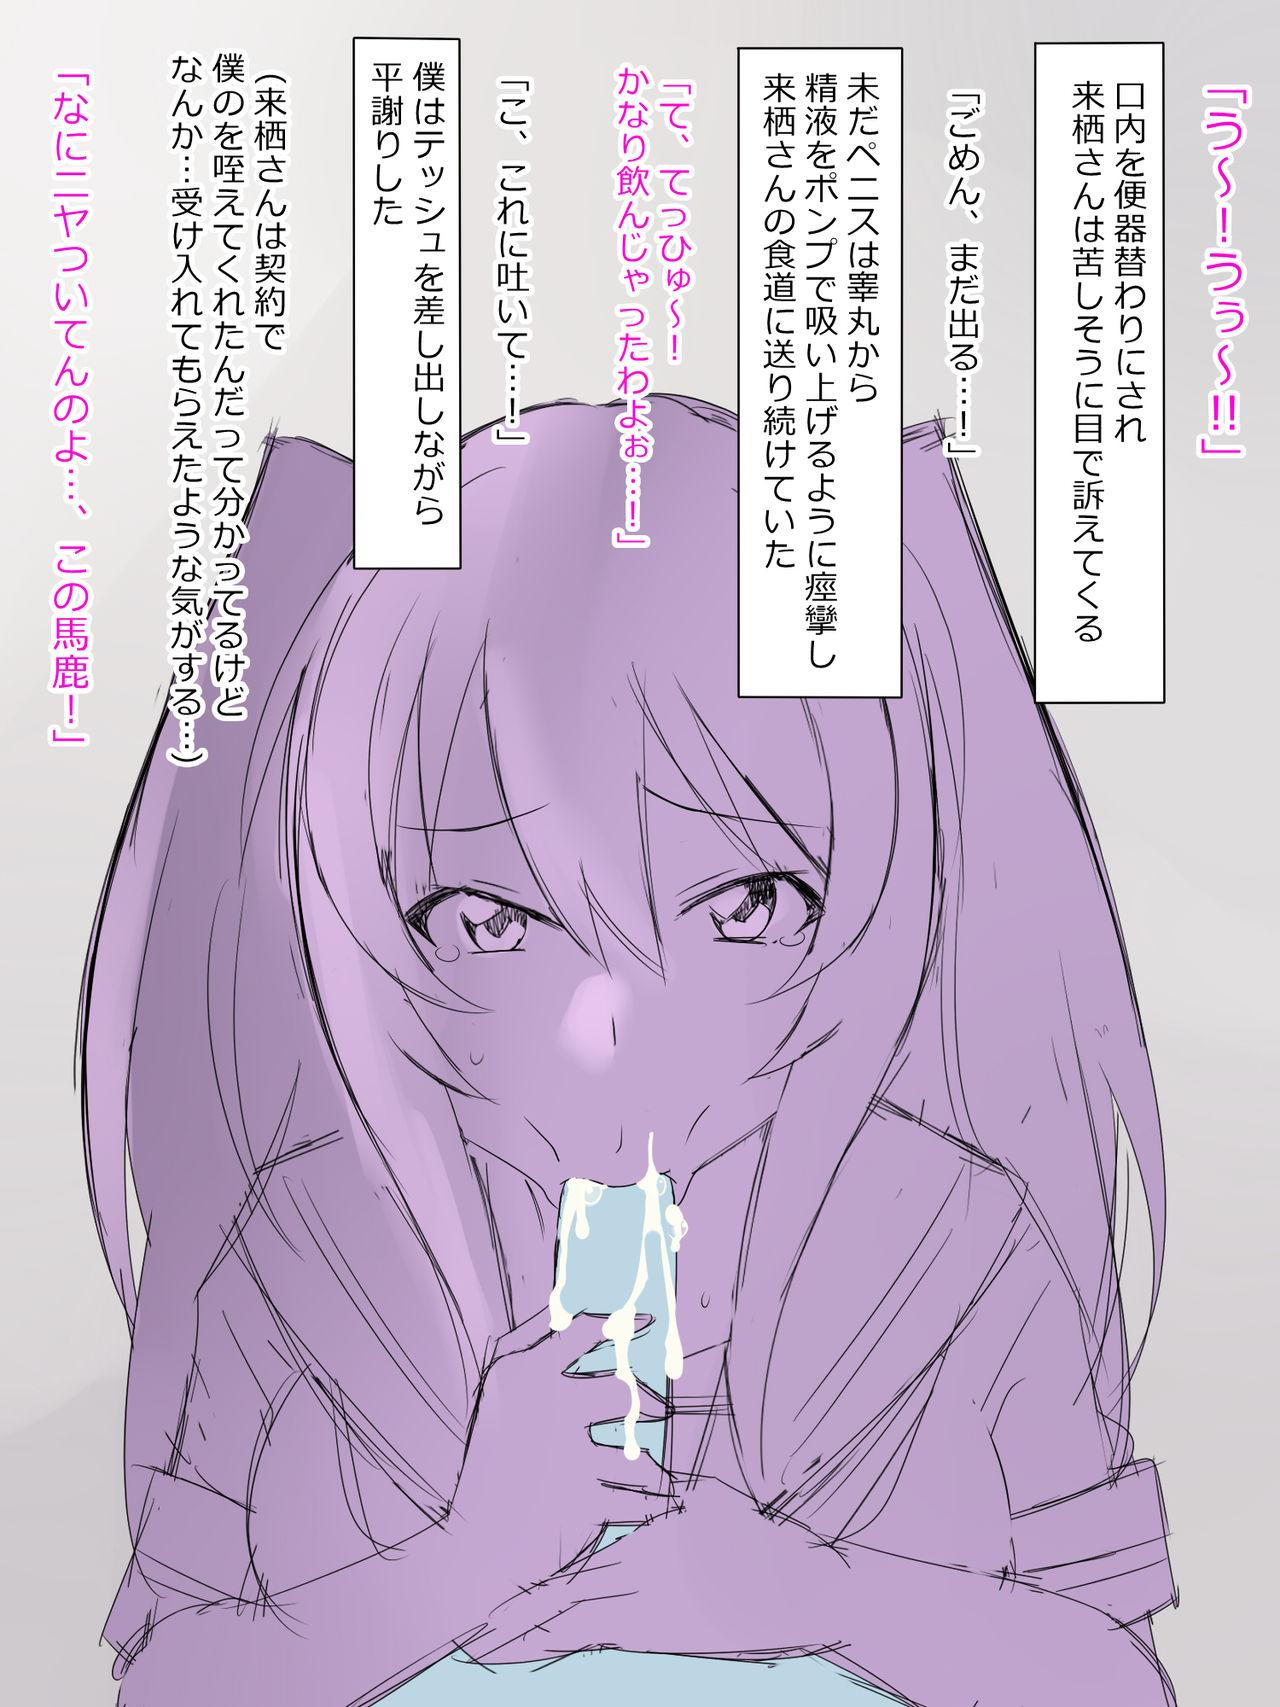 [Kagemusha] Arima-kun to 40-nin no Classmate 27